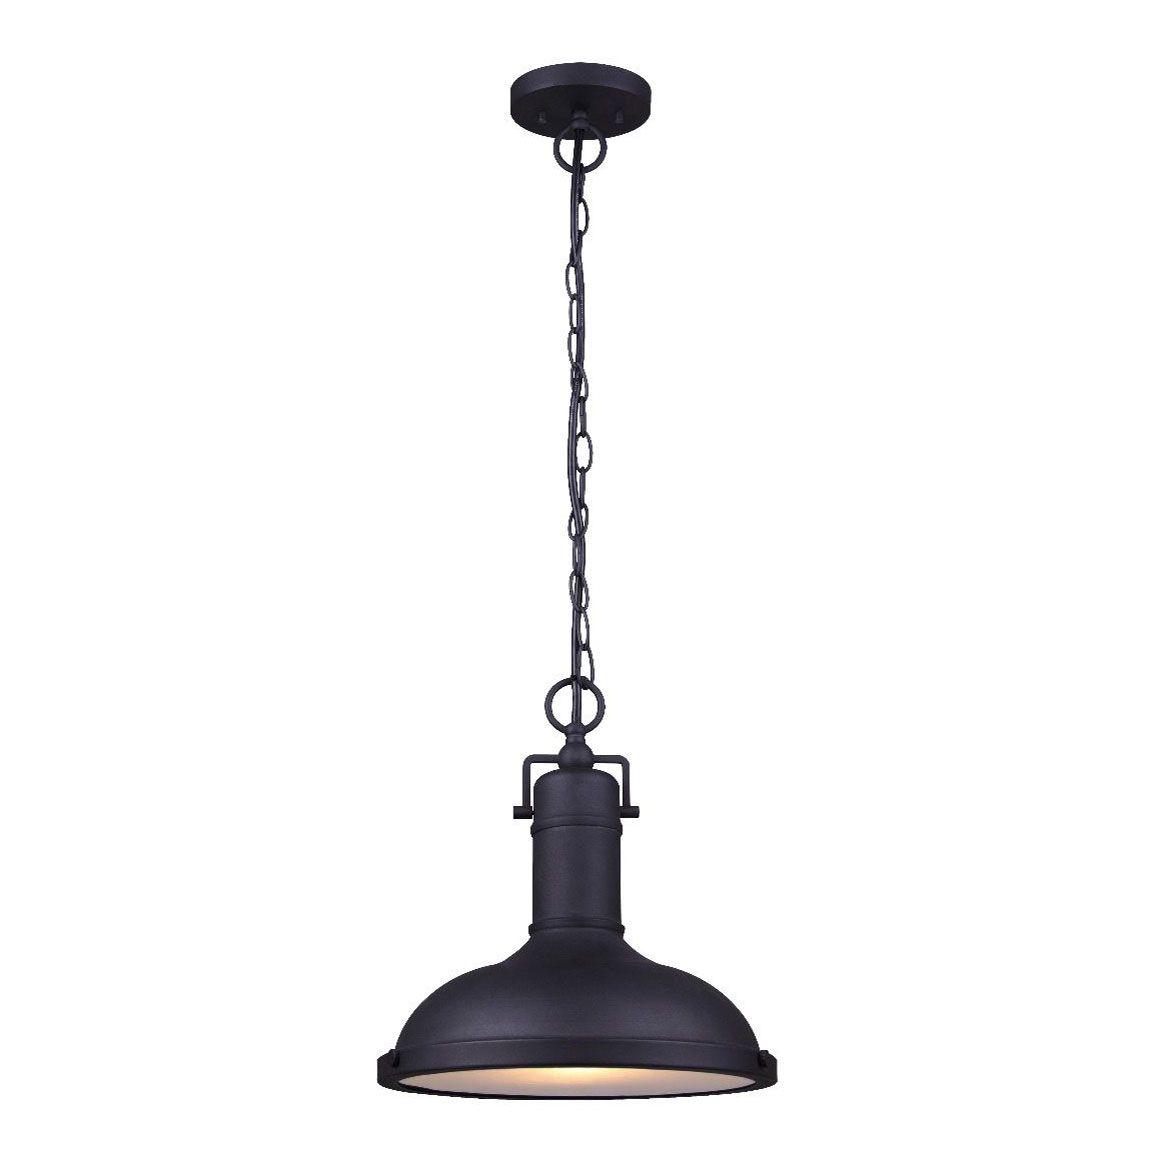 30058 luminaire suspendu industriel noir